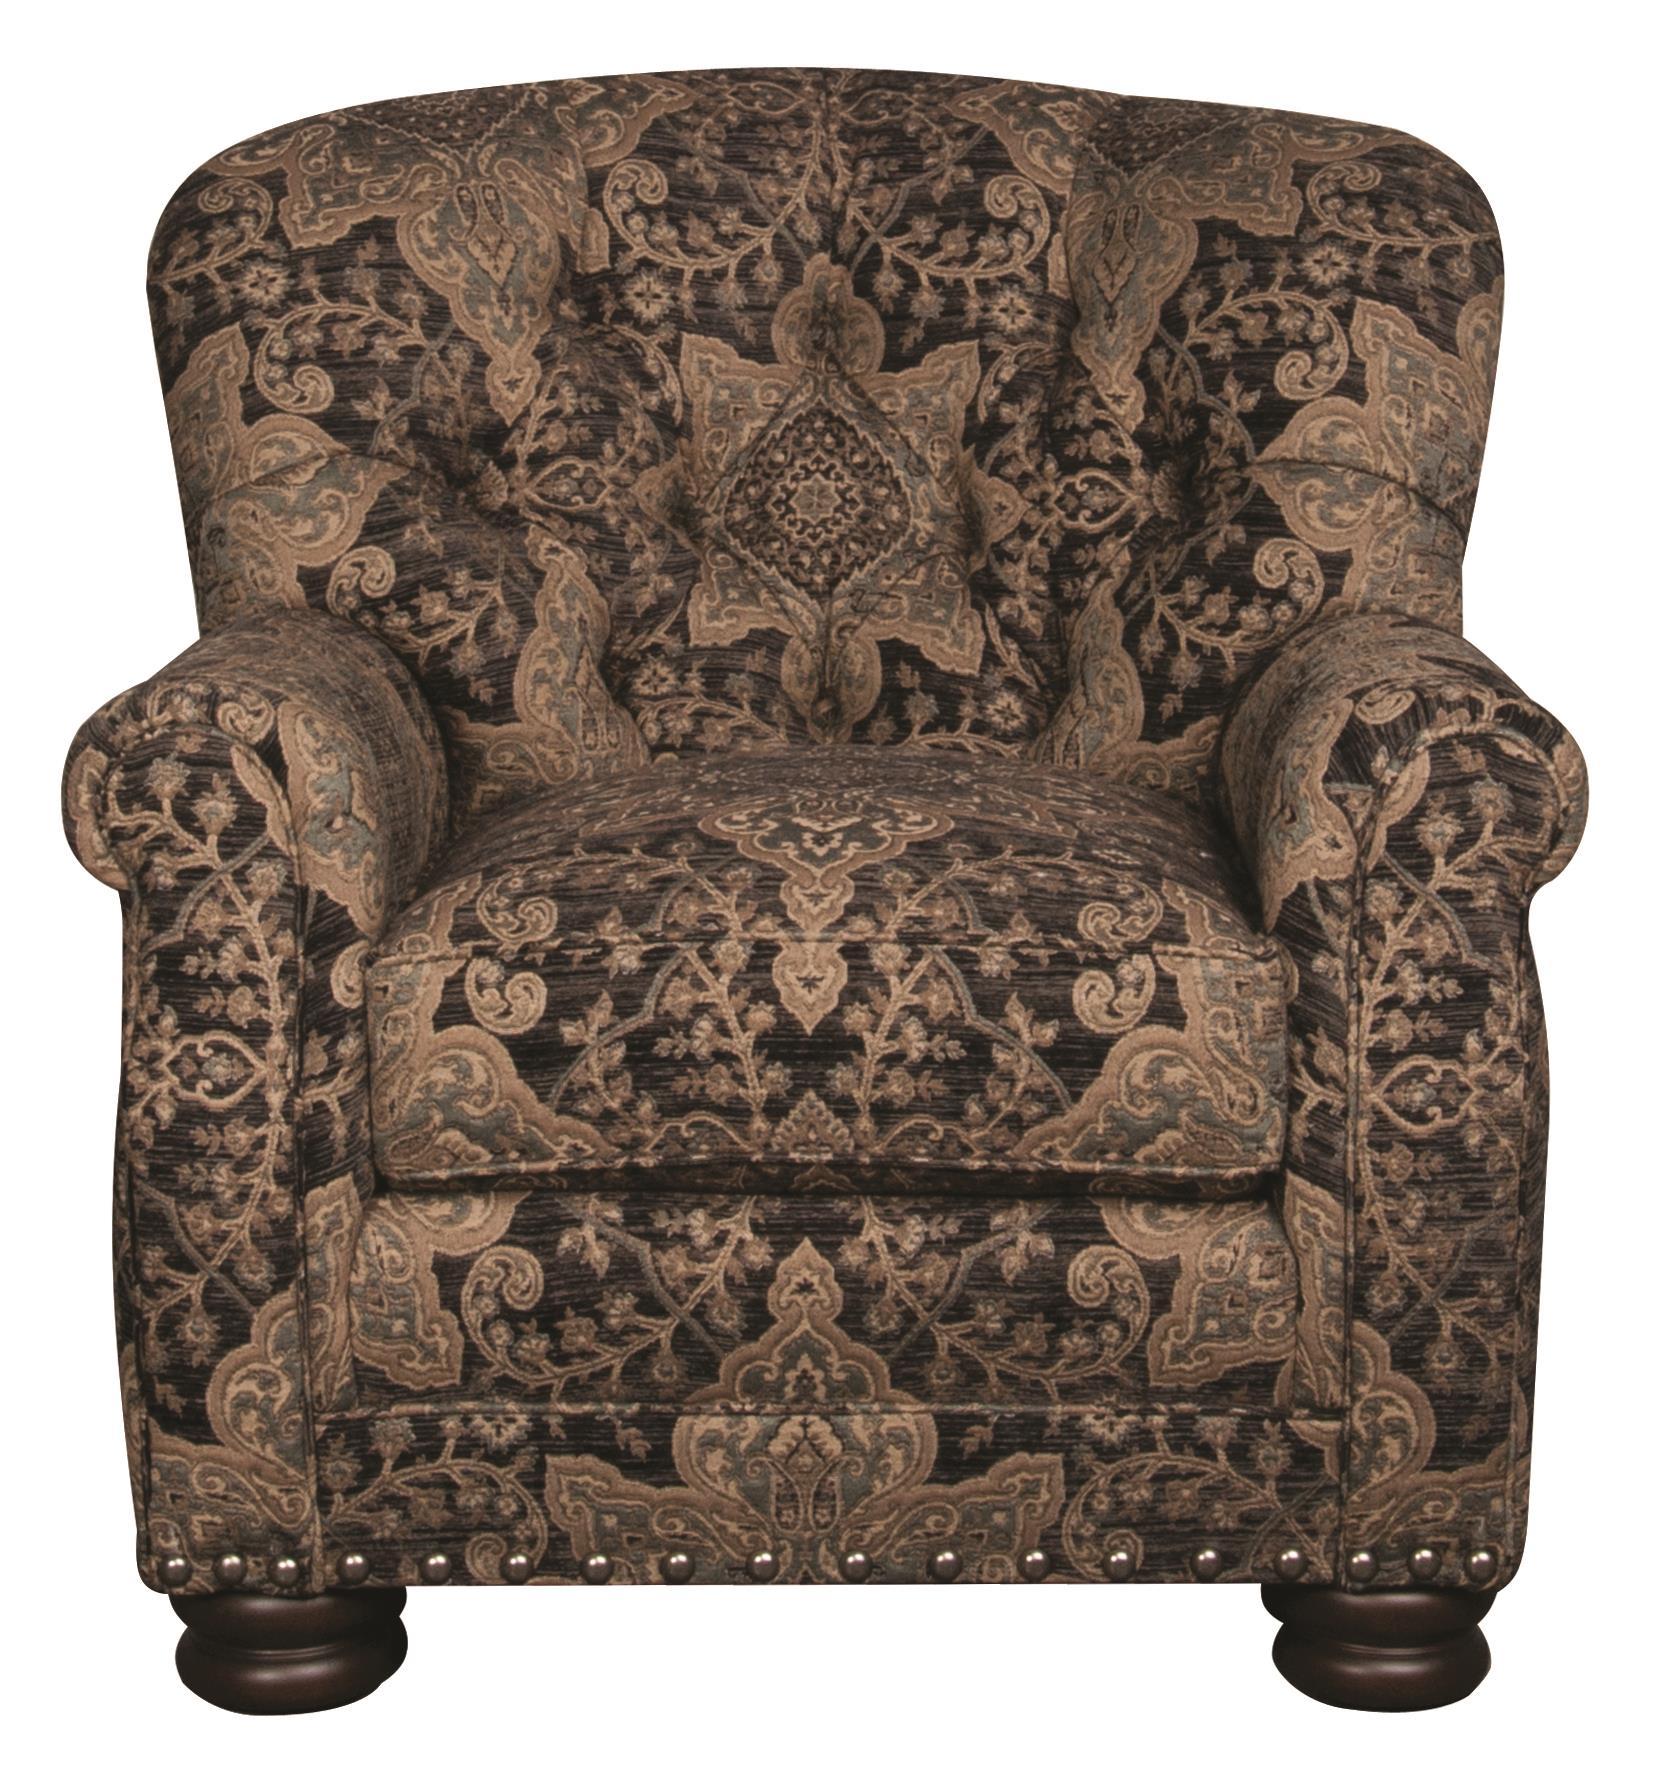 Morris Home Furnishings Duke Duke Accent Chair - Item Number: 109275758